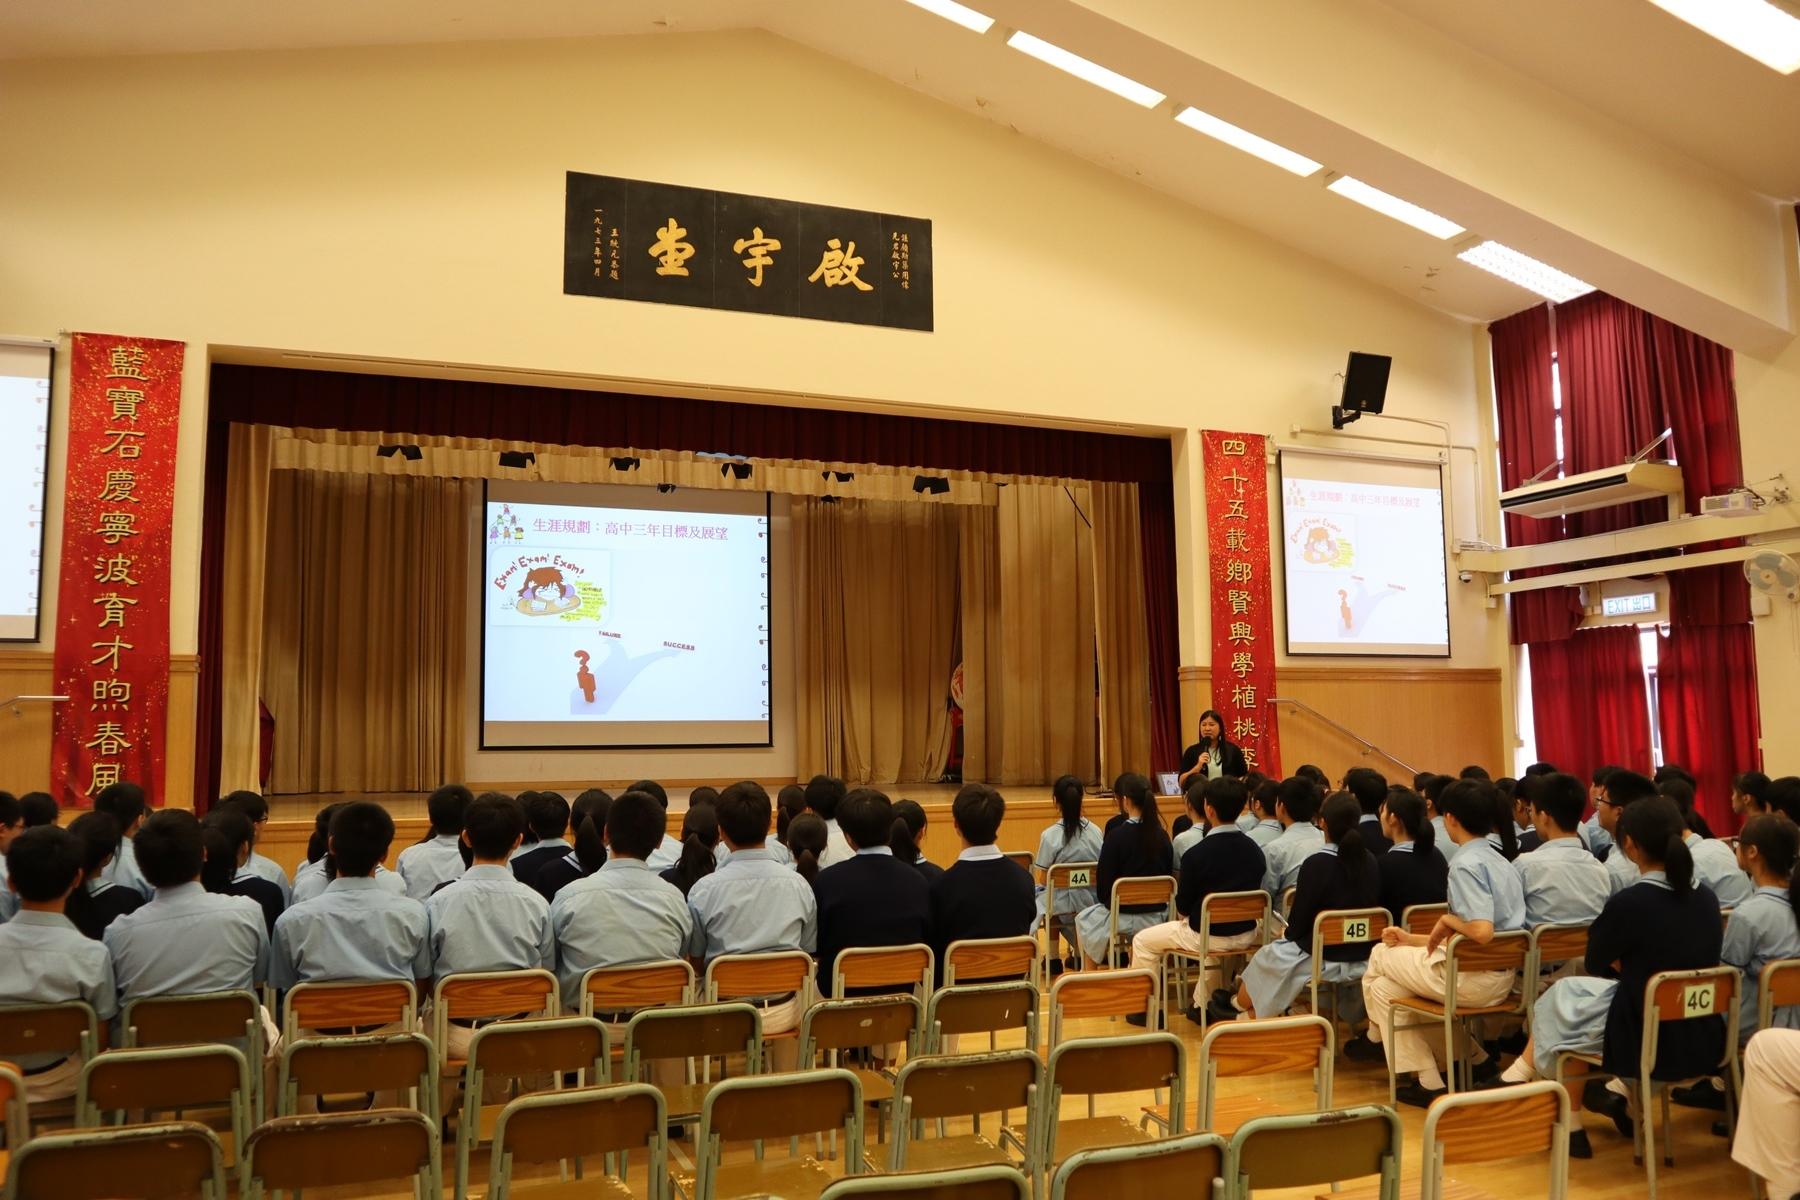 http://npc.edu.hk/sites/default/files/img_9650.jpg